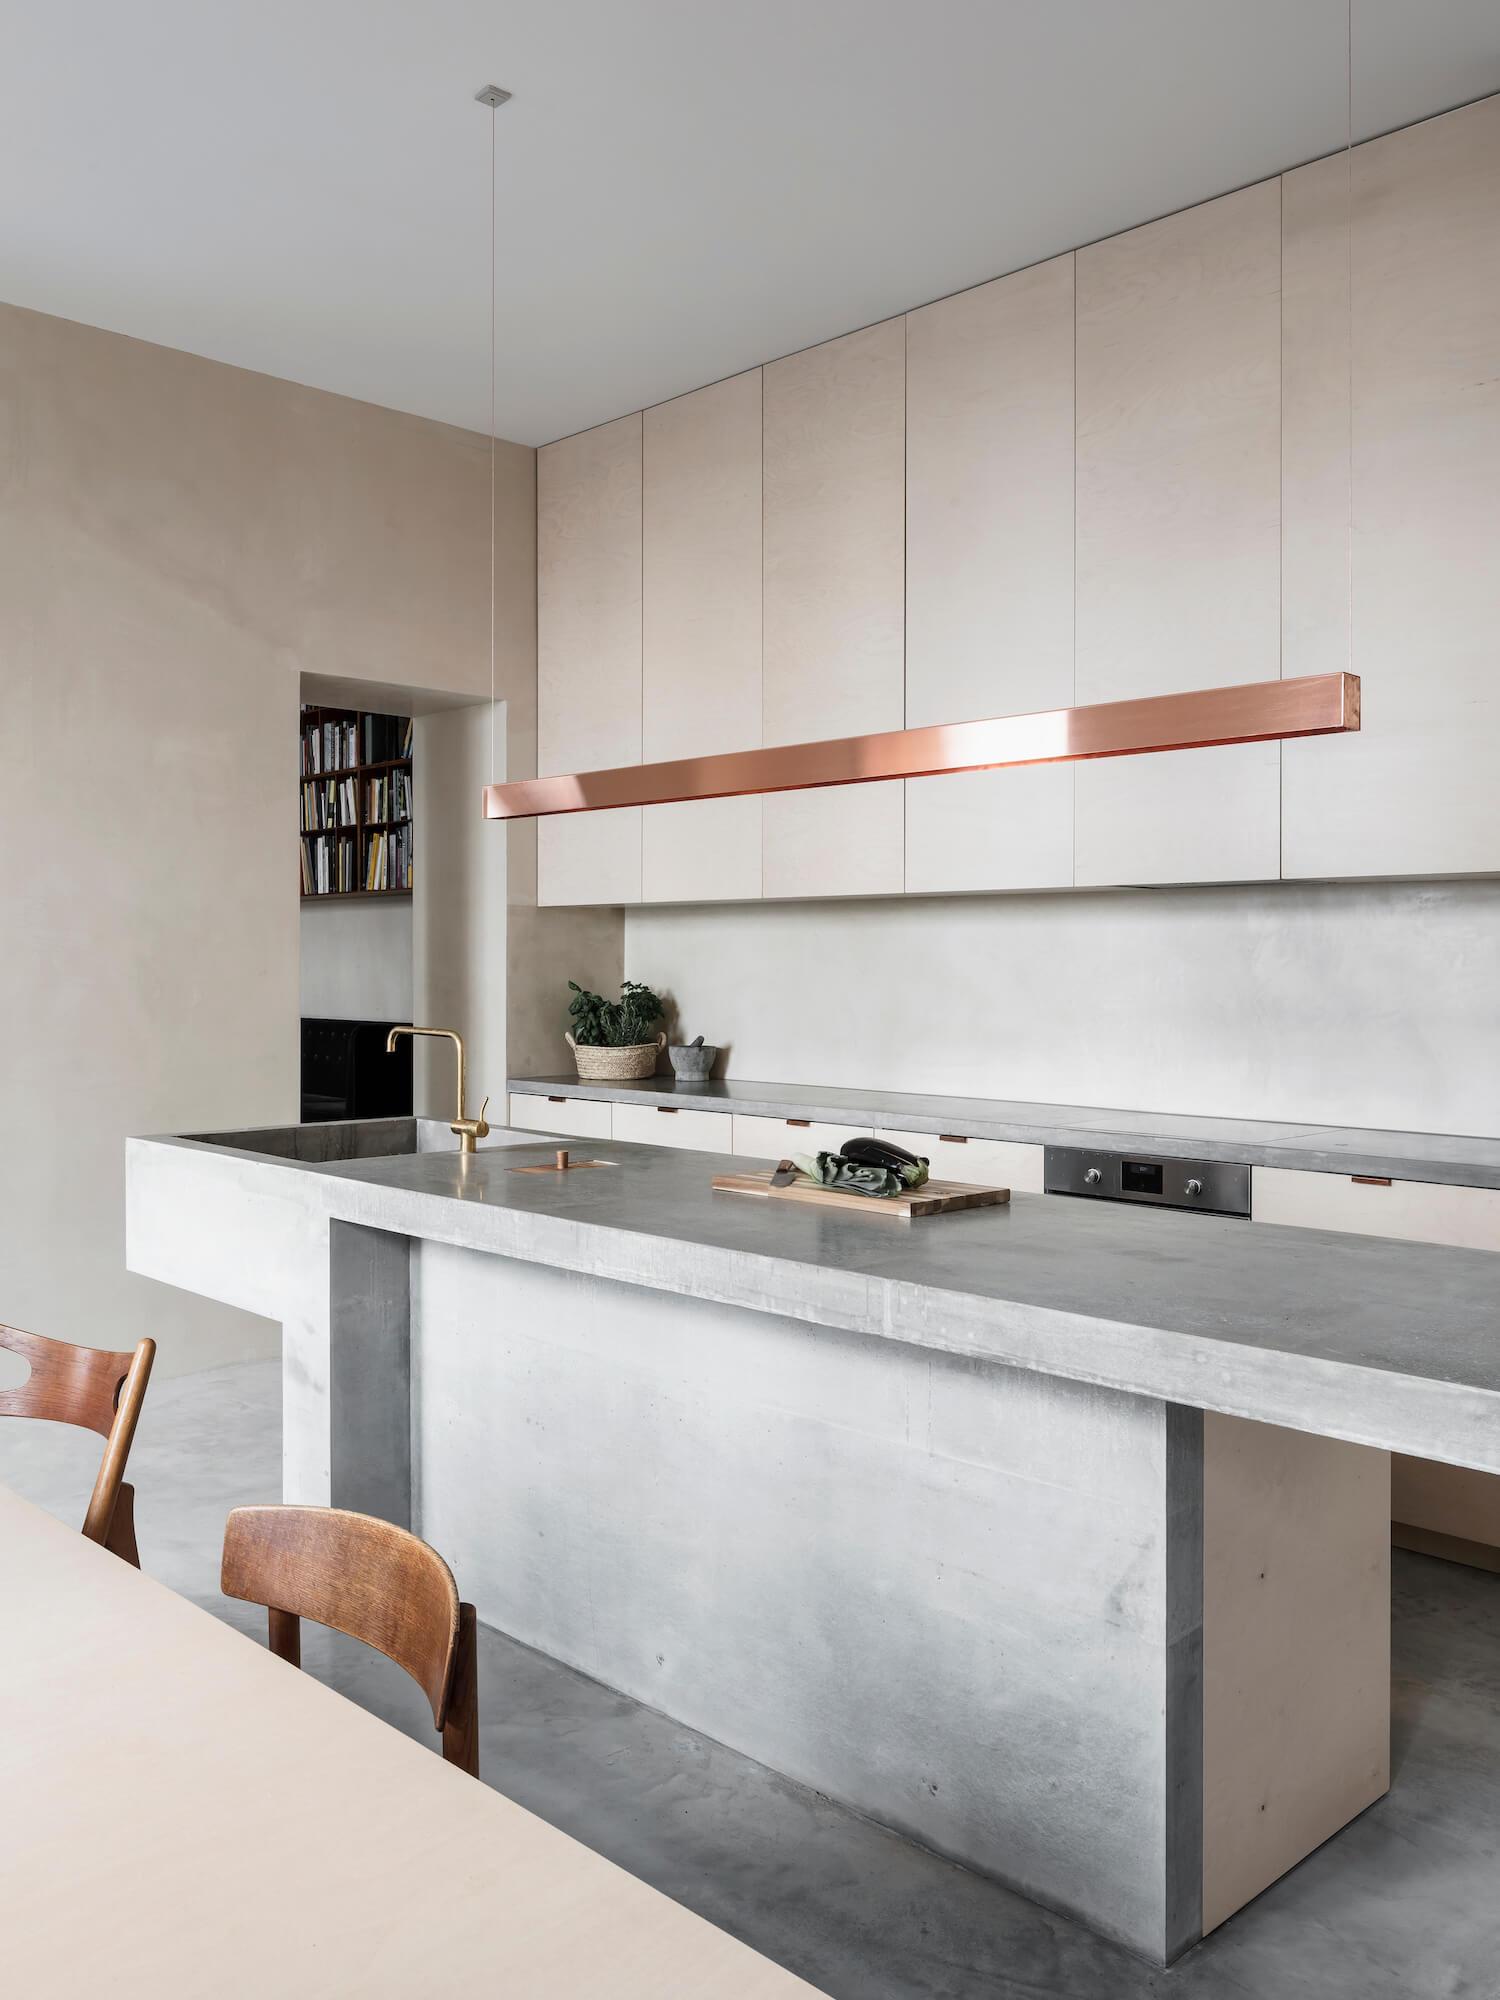 est-living-interiors-mar-plus-ask-glogauer-strasse-13.jpg